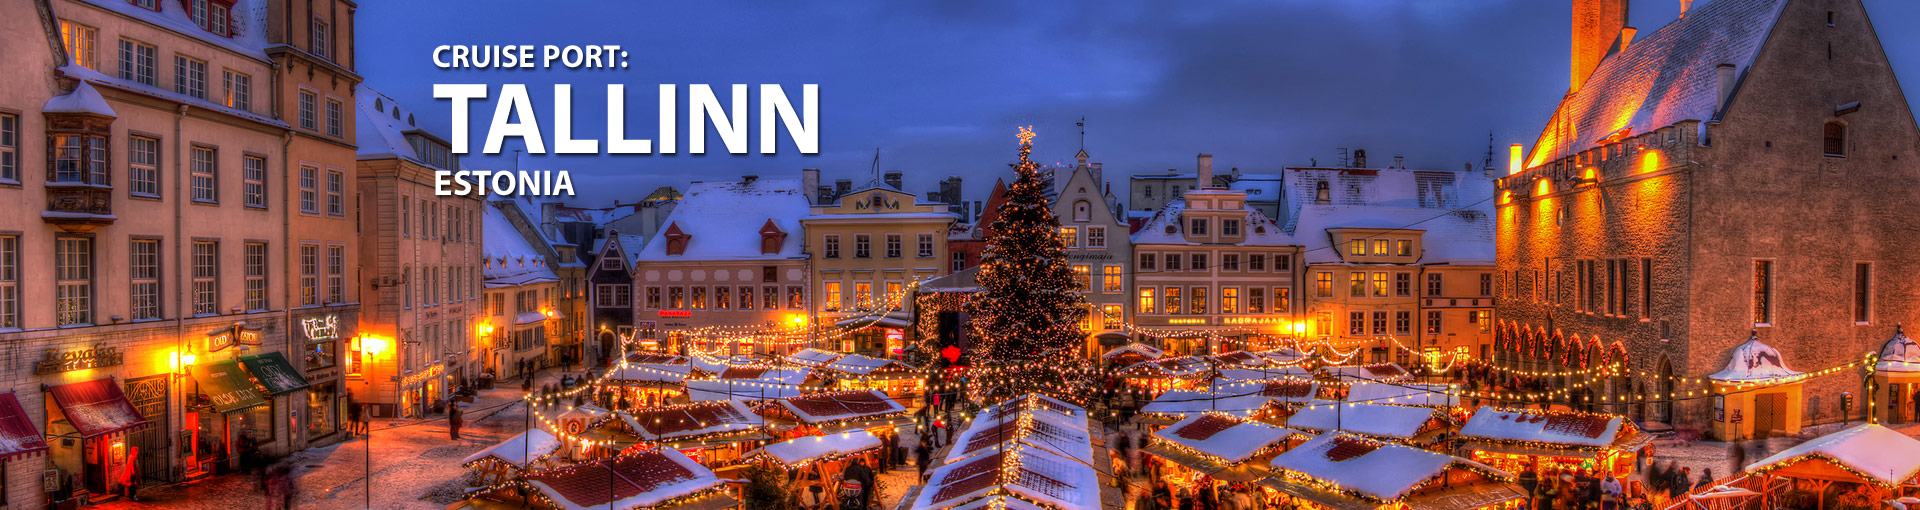 tallinn-estonia-cruise-port-banner